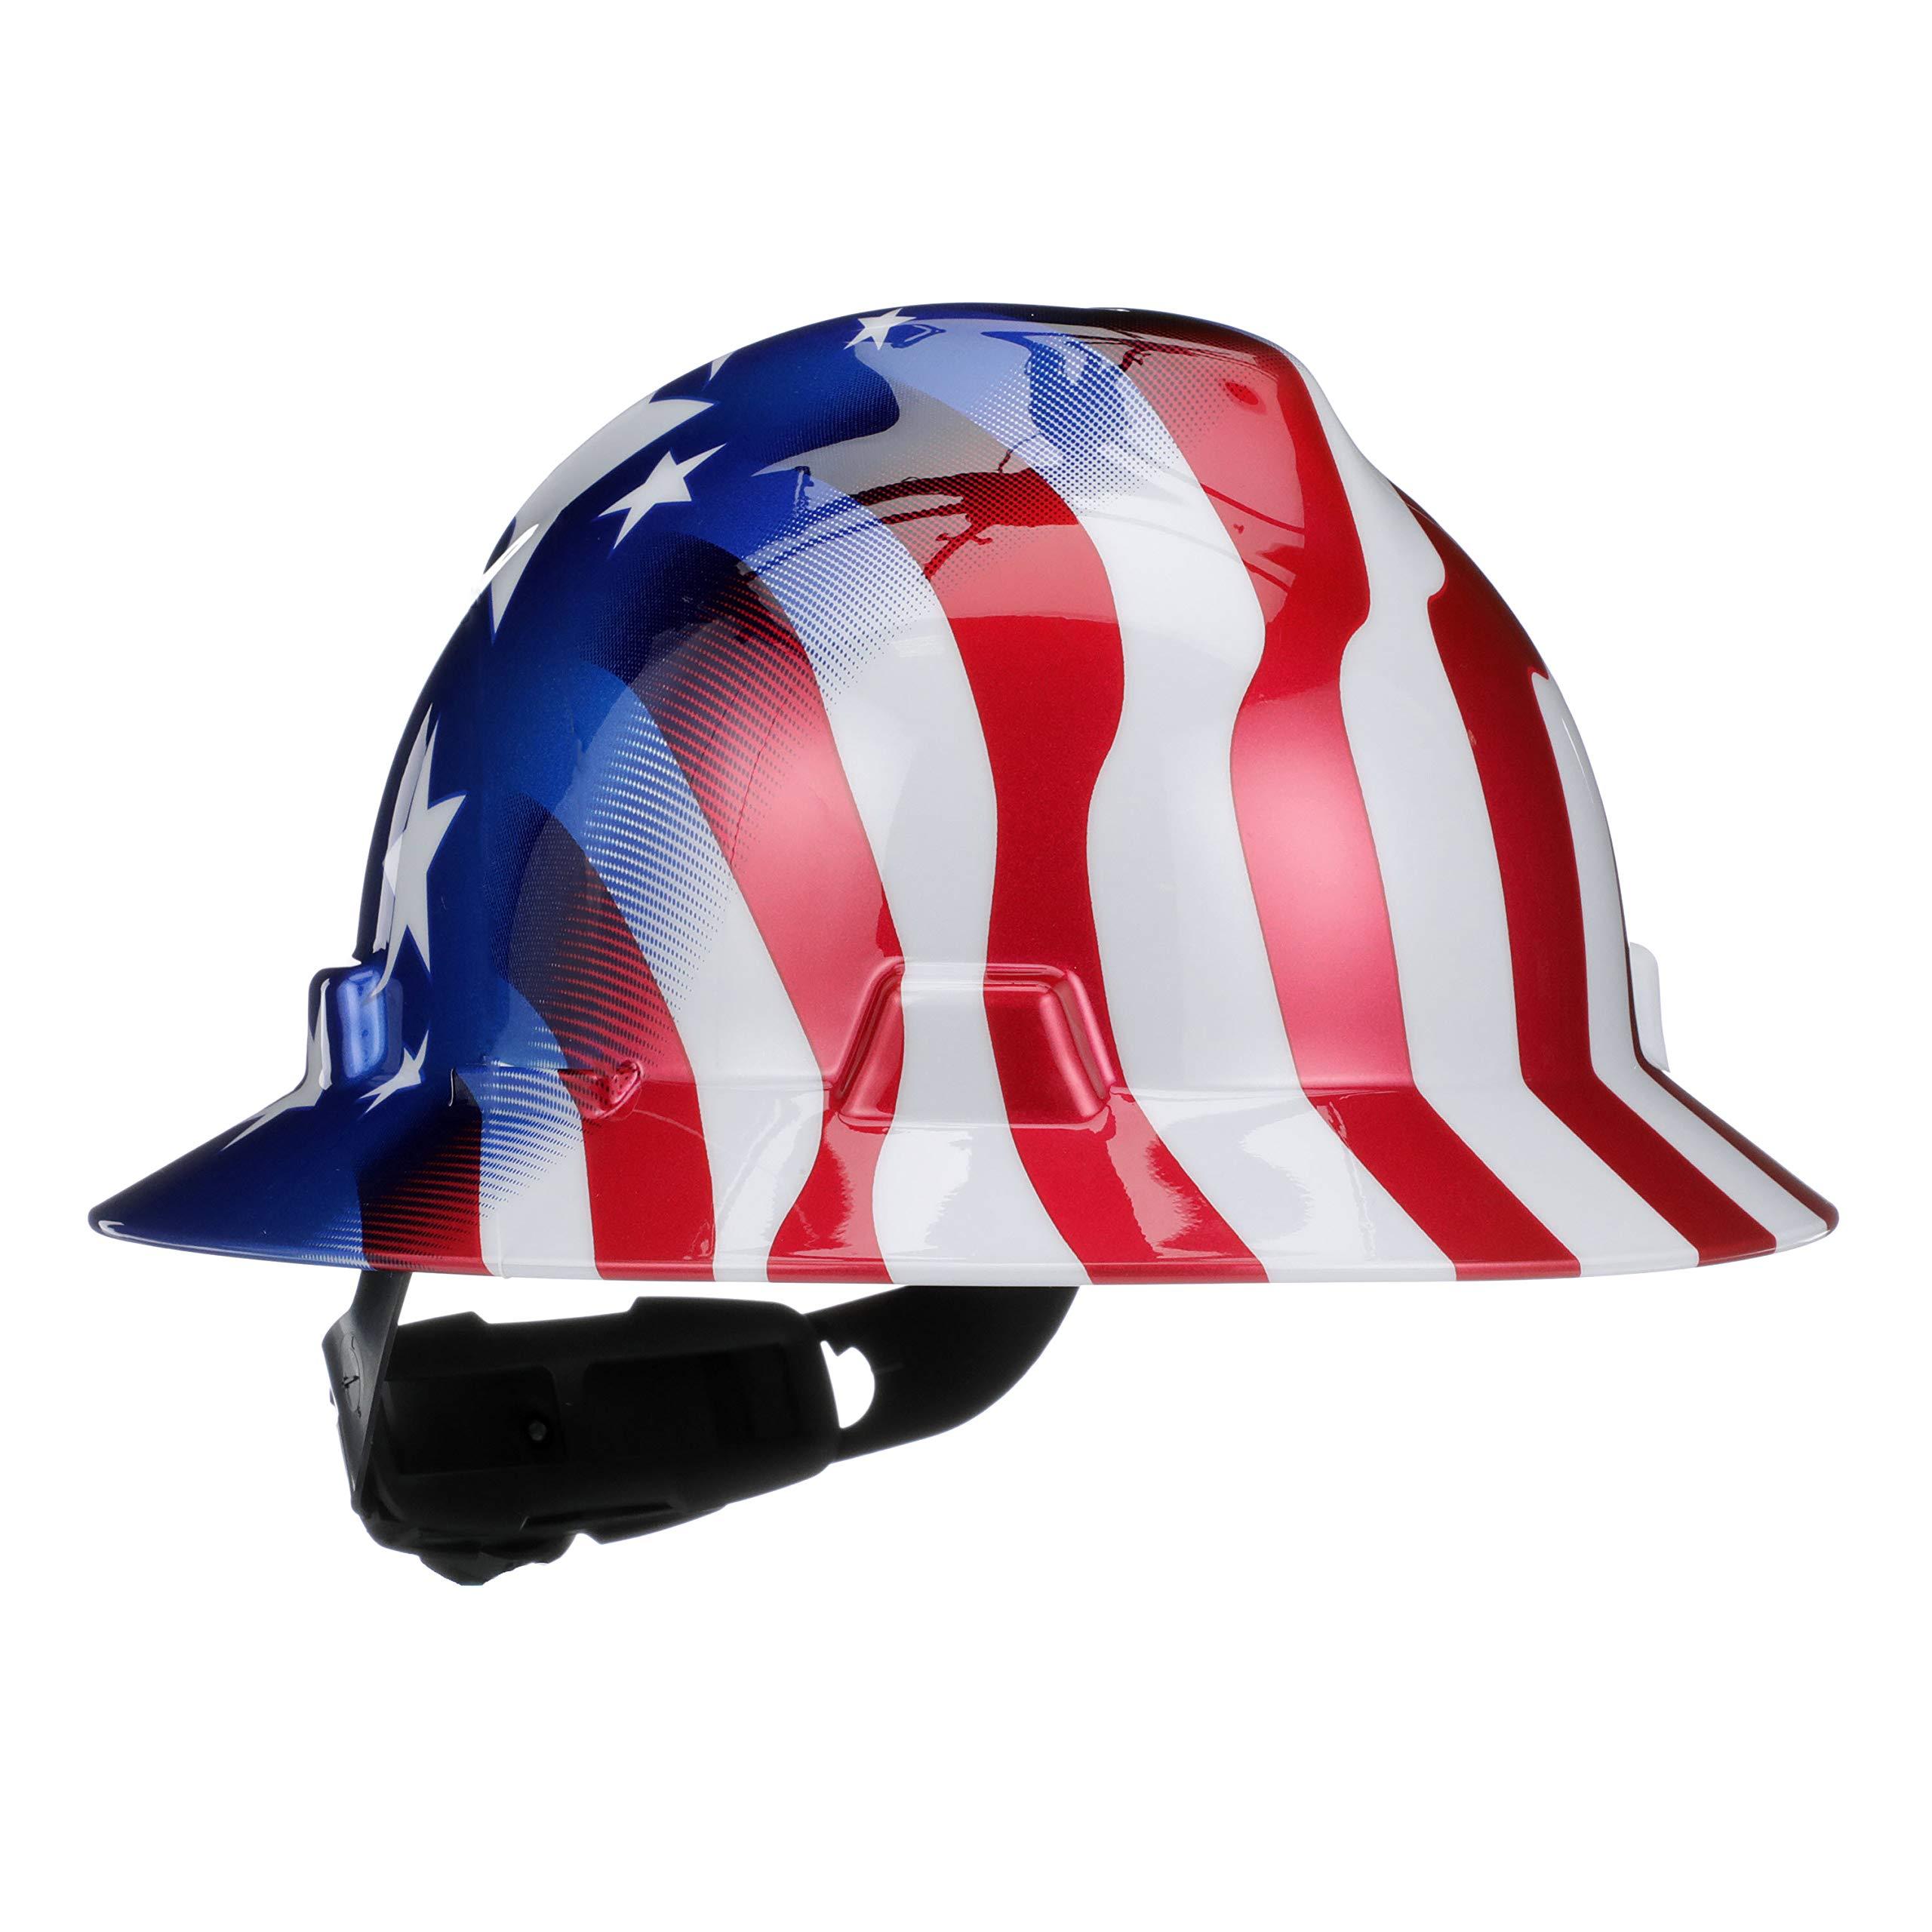 MSA 10071157 V-Gard Full-Brim Hard Hat, Stars & Strips,, Capacity, Volume, Polyethylene, Standard, Red/White/Blue by MSA